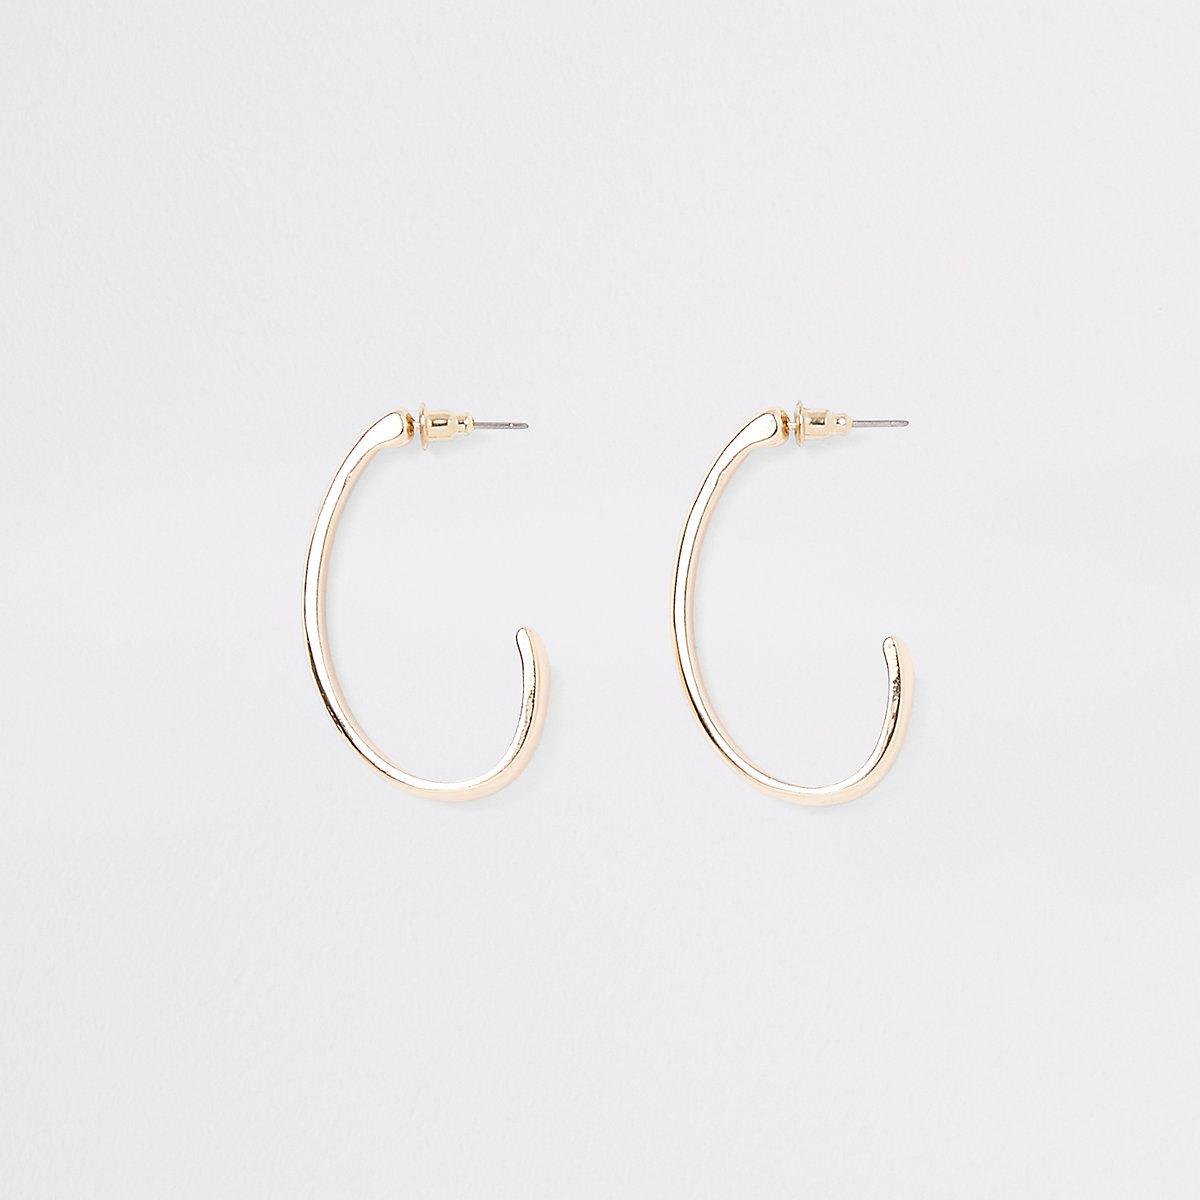 Gold tone small oval hoop earrings